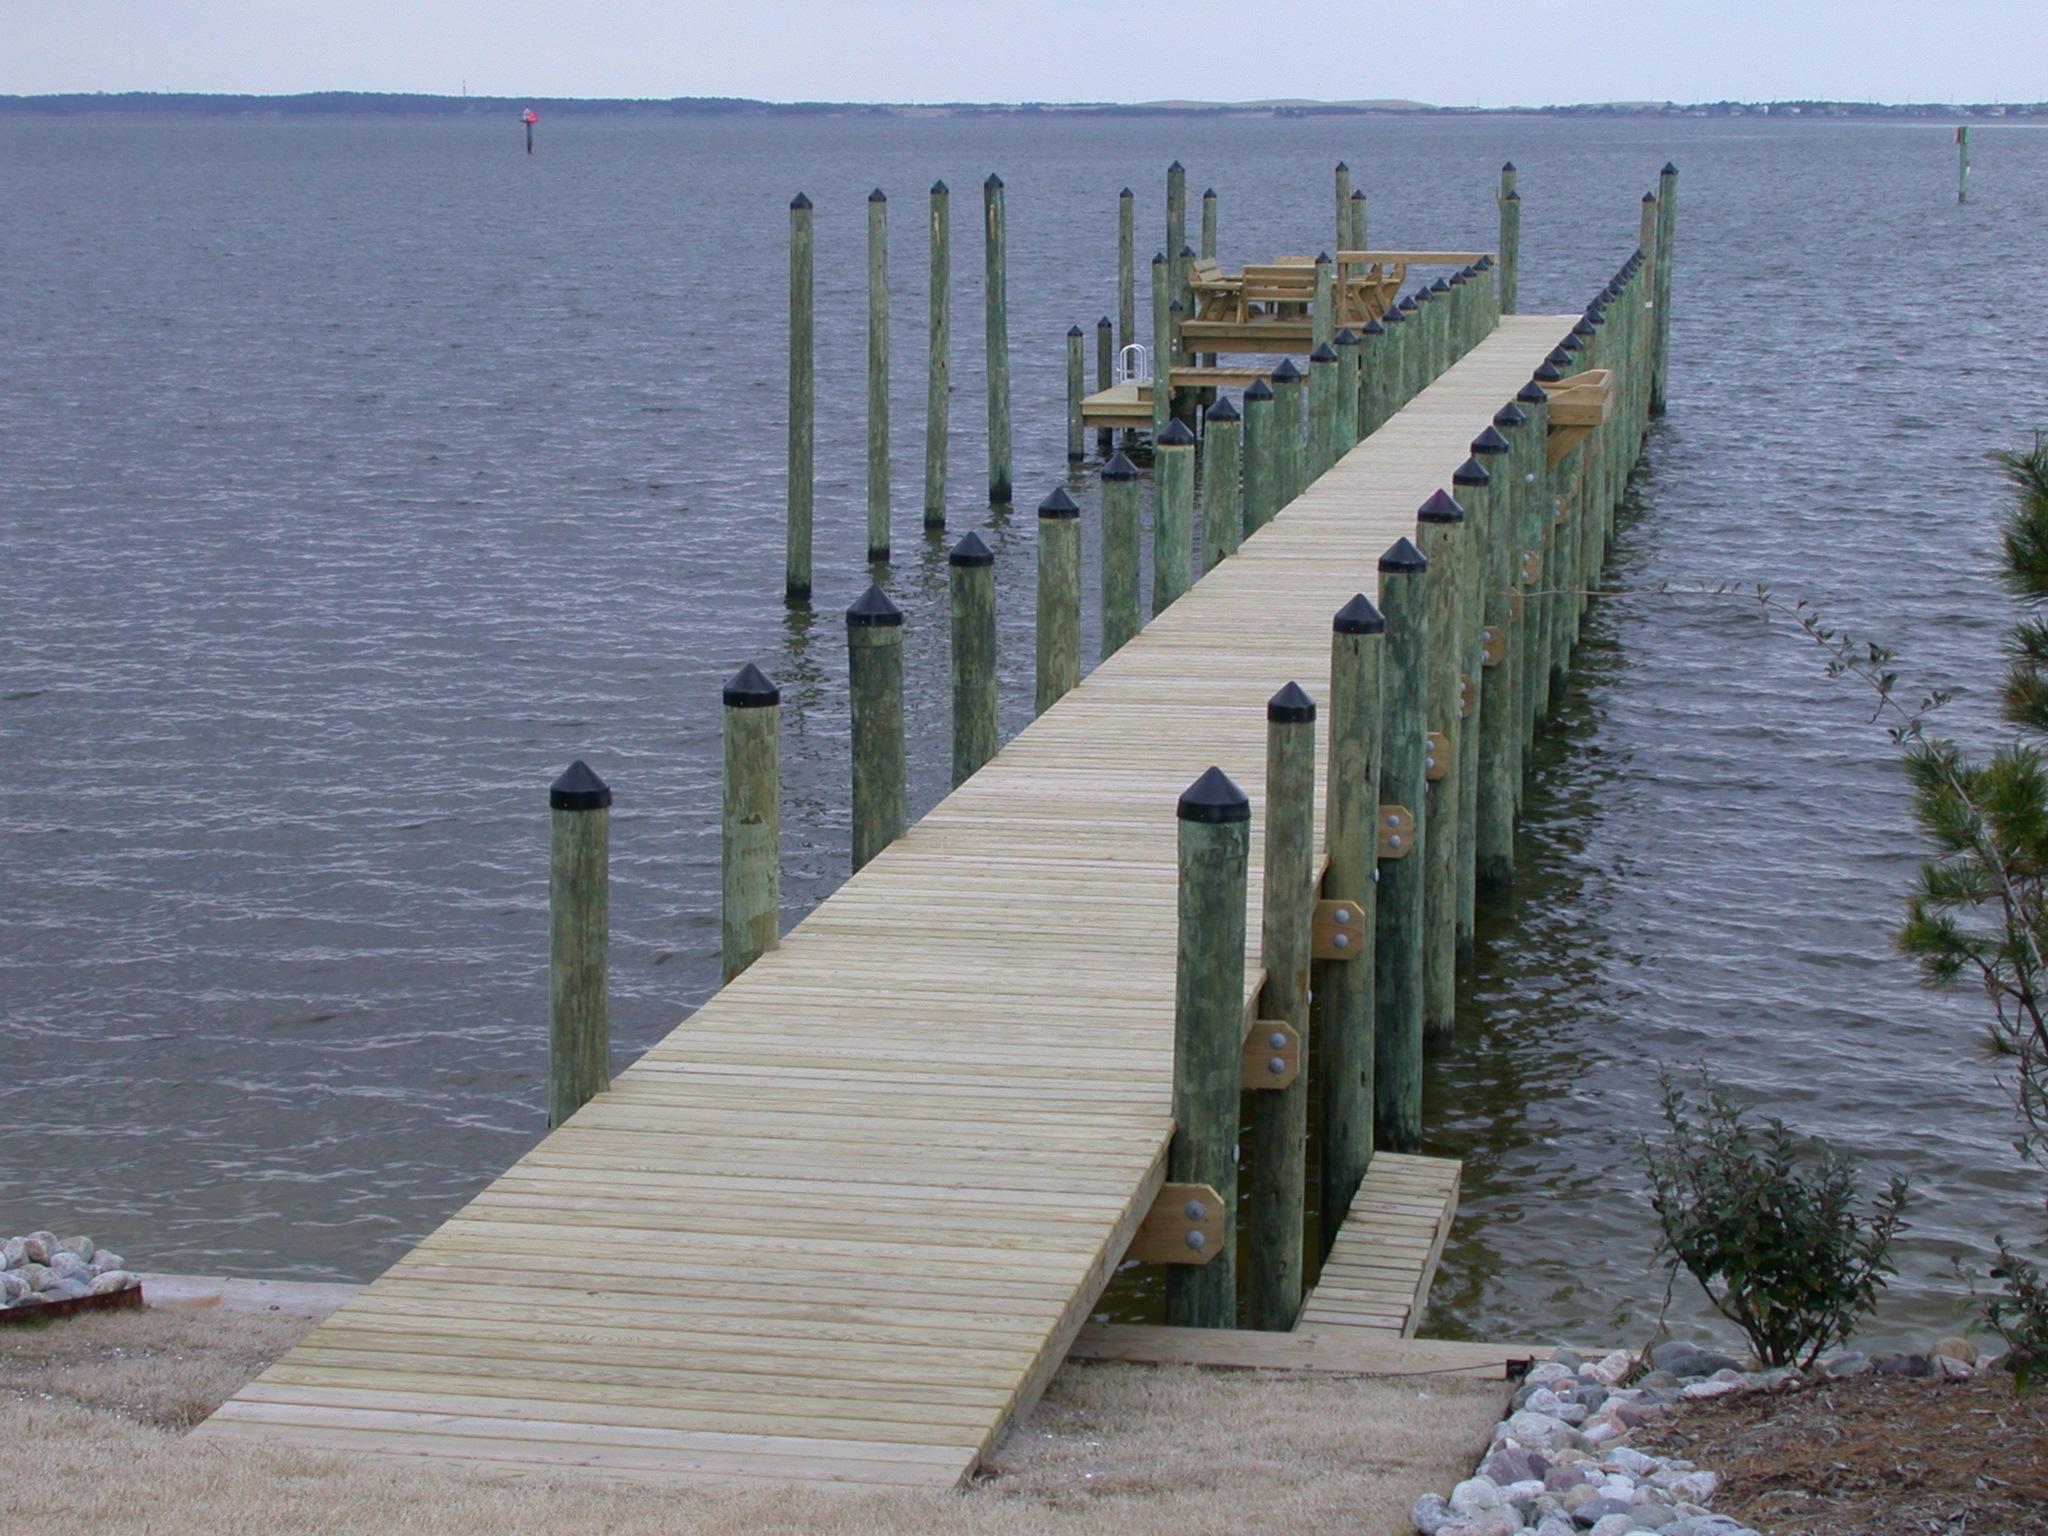 docks-piers-7.jpg